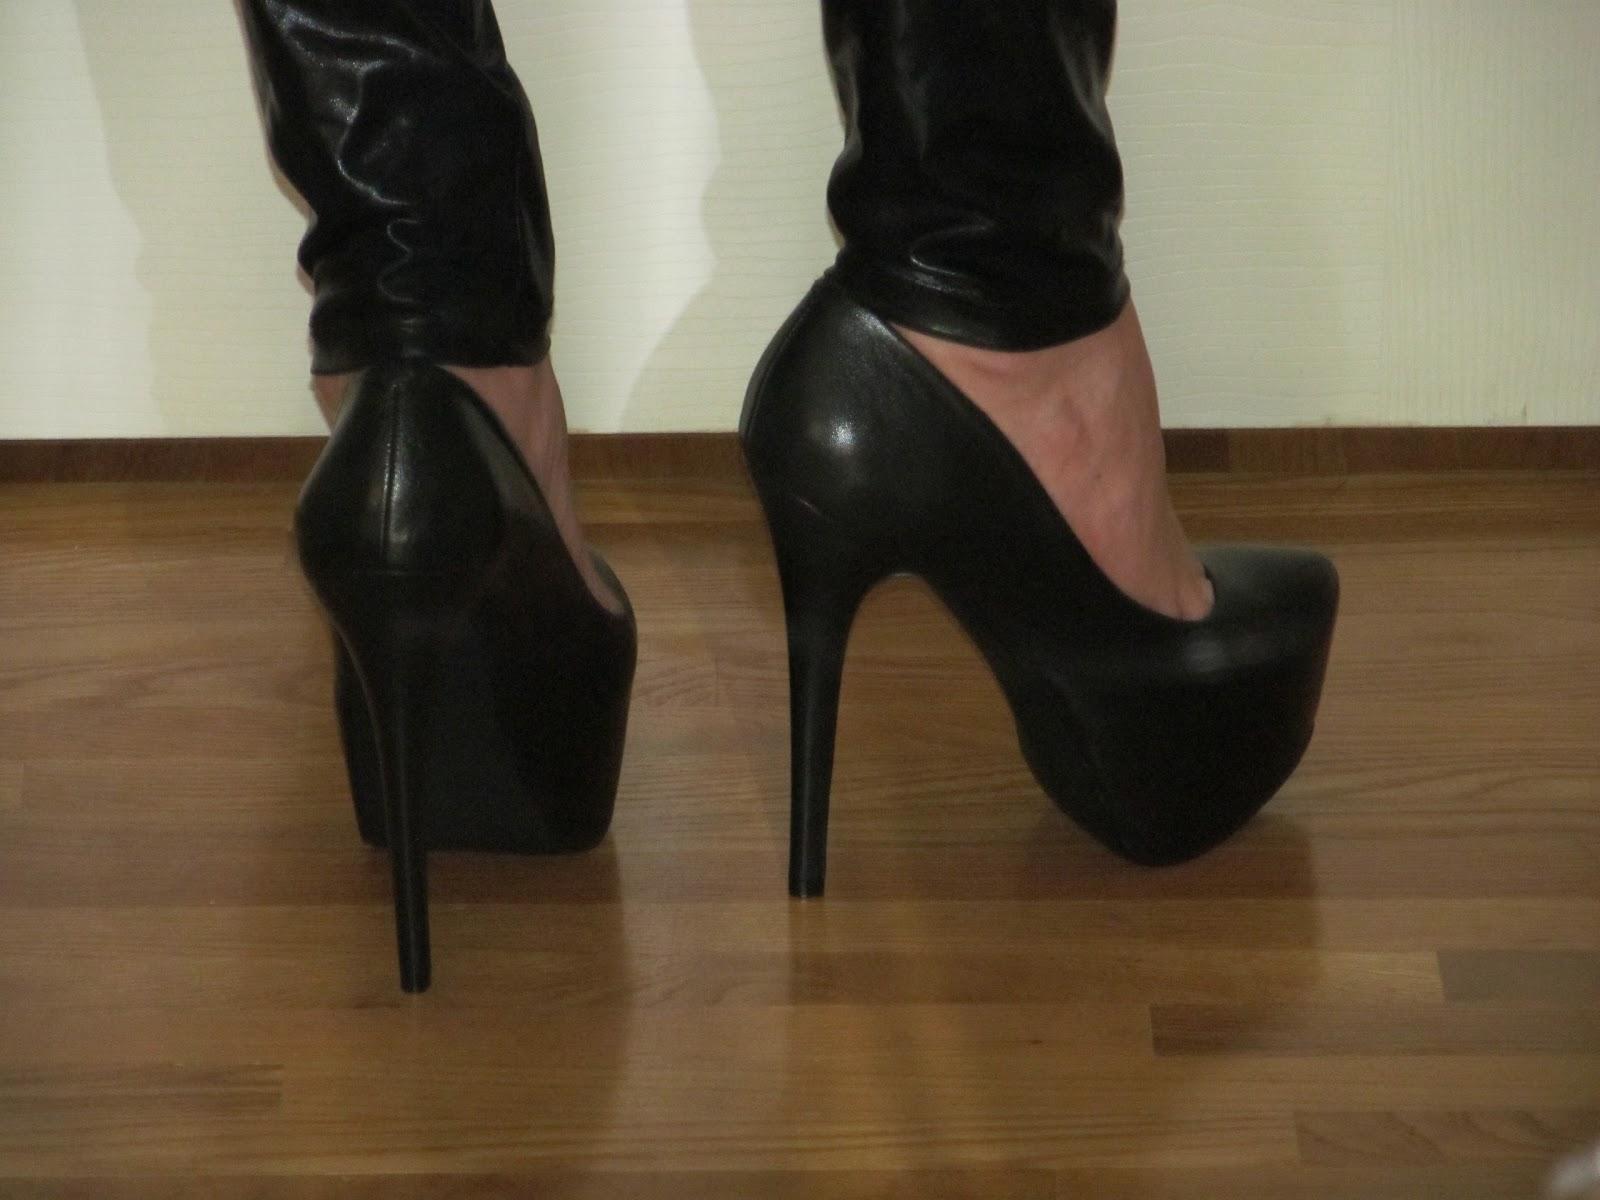 f645496cb7d Me Wearing My Black Leather Steve Madden  Dejavu  Platform Pumps With  Liquid Leggings